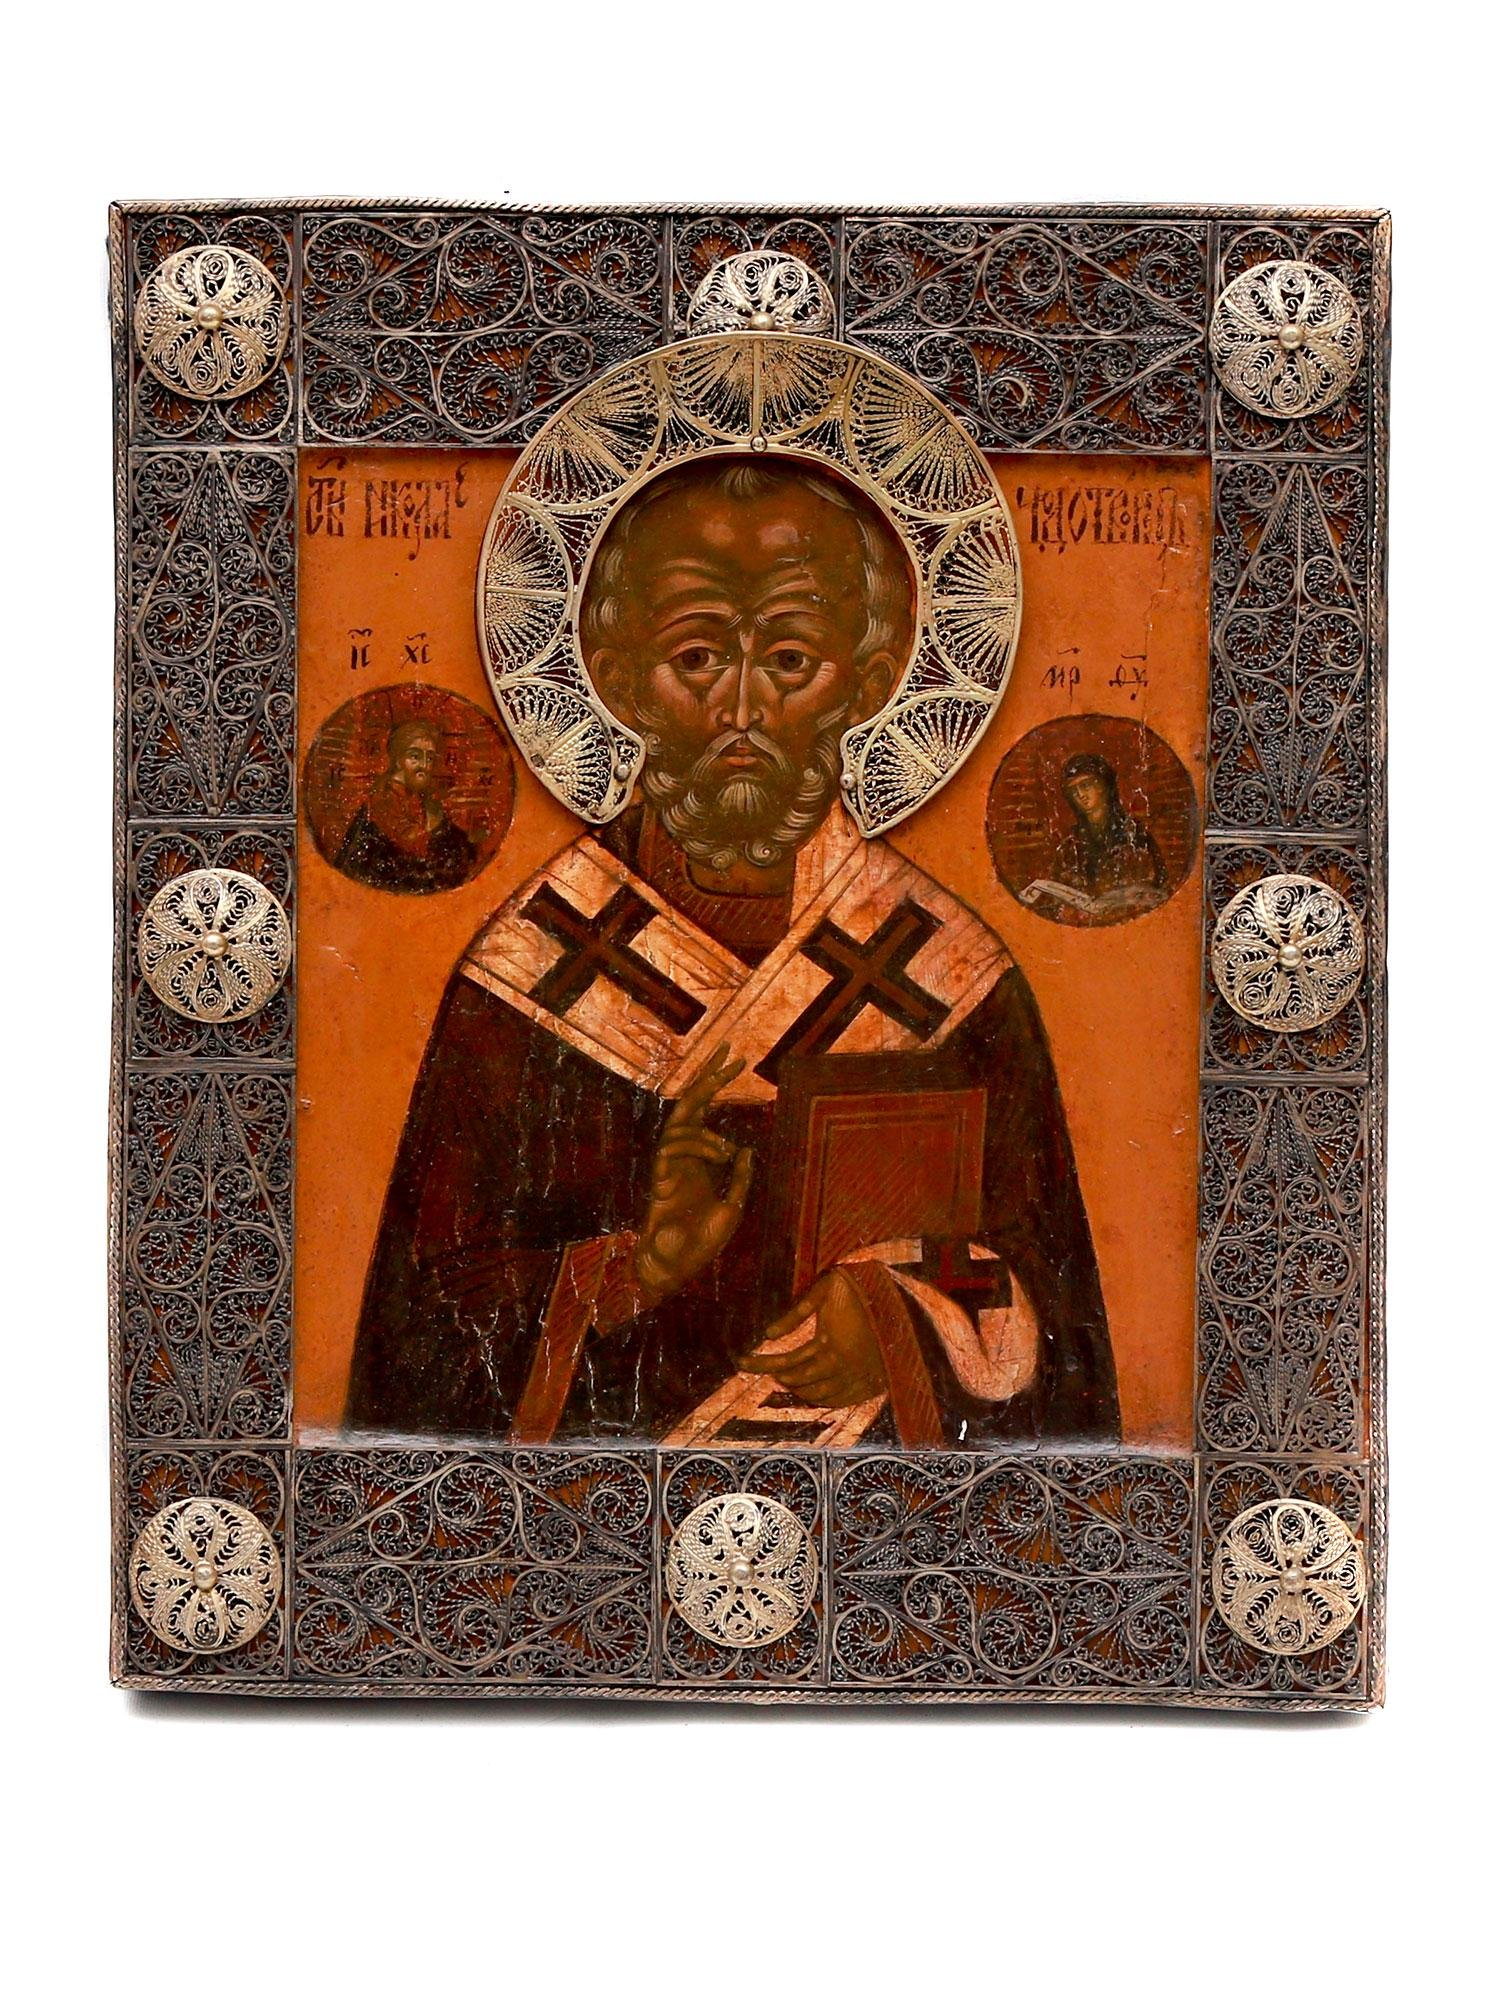 A RUSSIAN ORTHODOX ICON OF ST. NICHOLS in SILVER OKLAD